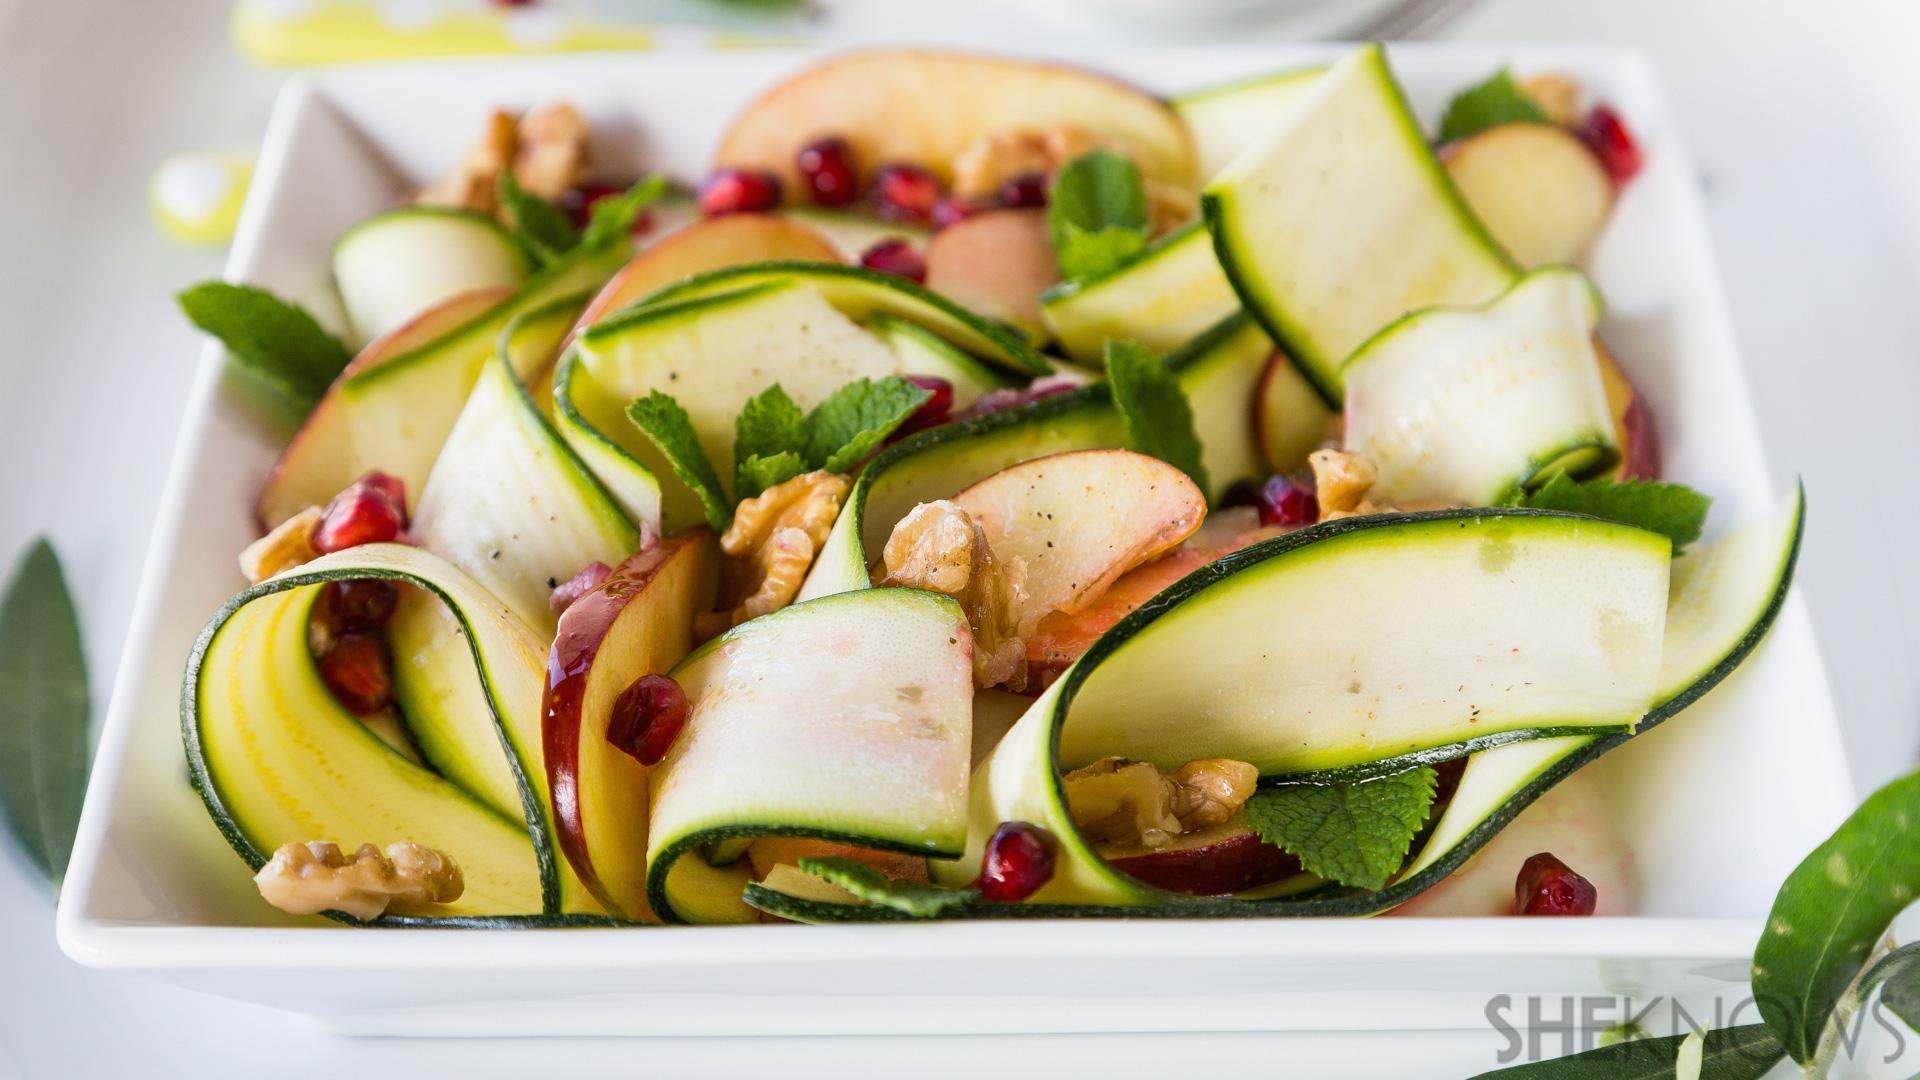 Raw zucchini, apple and walnut salad with pomegranate dressing recipe